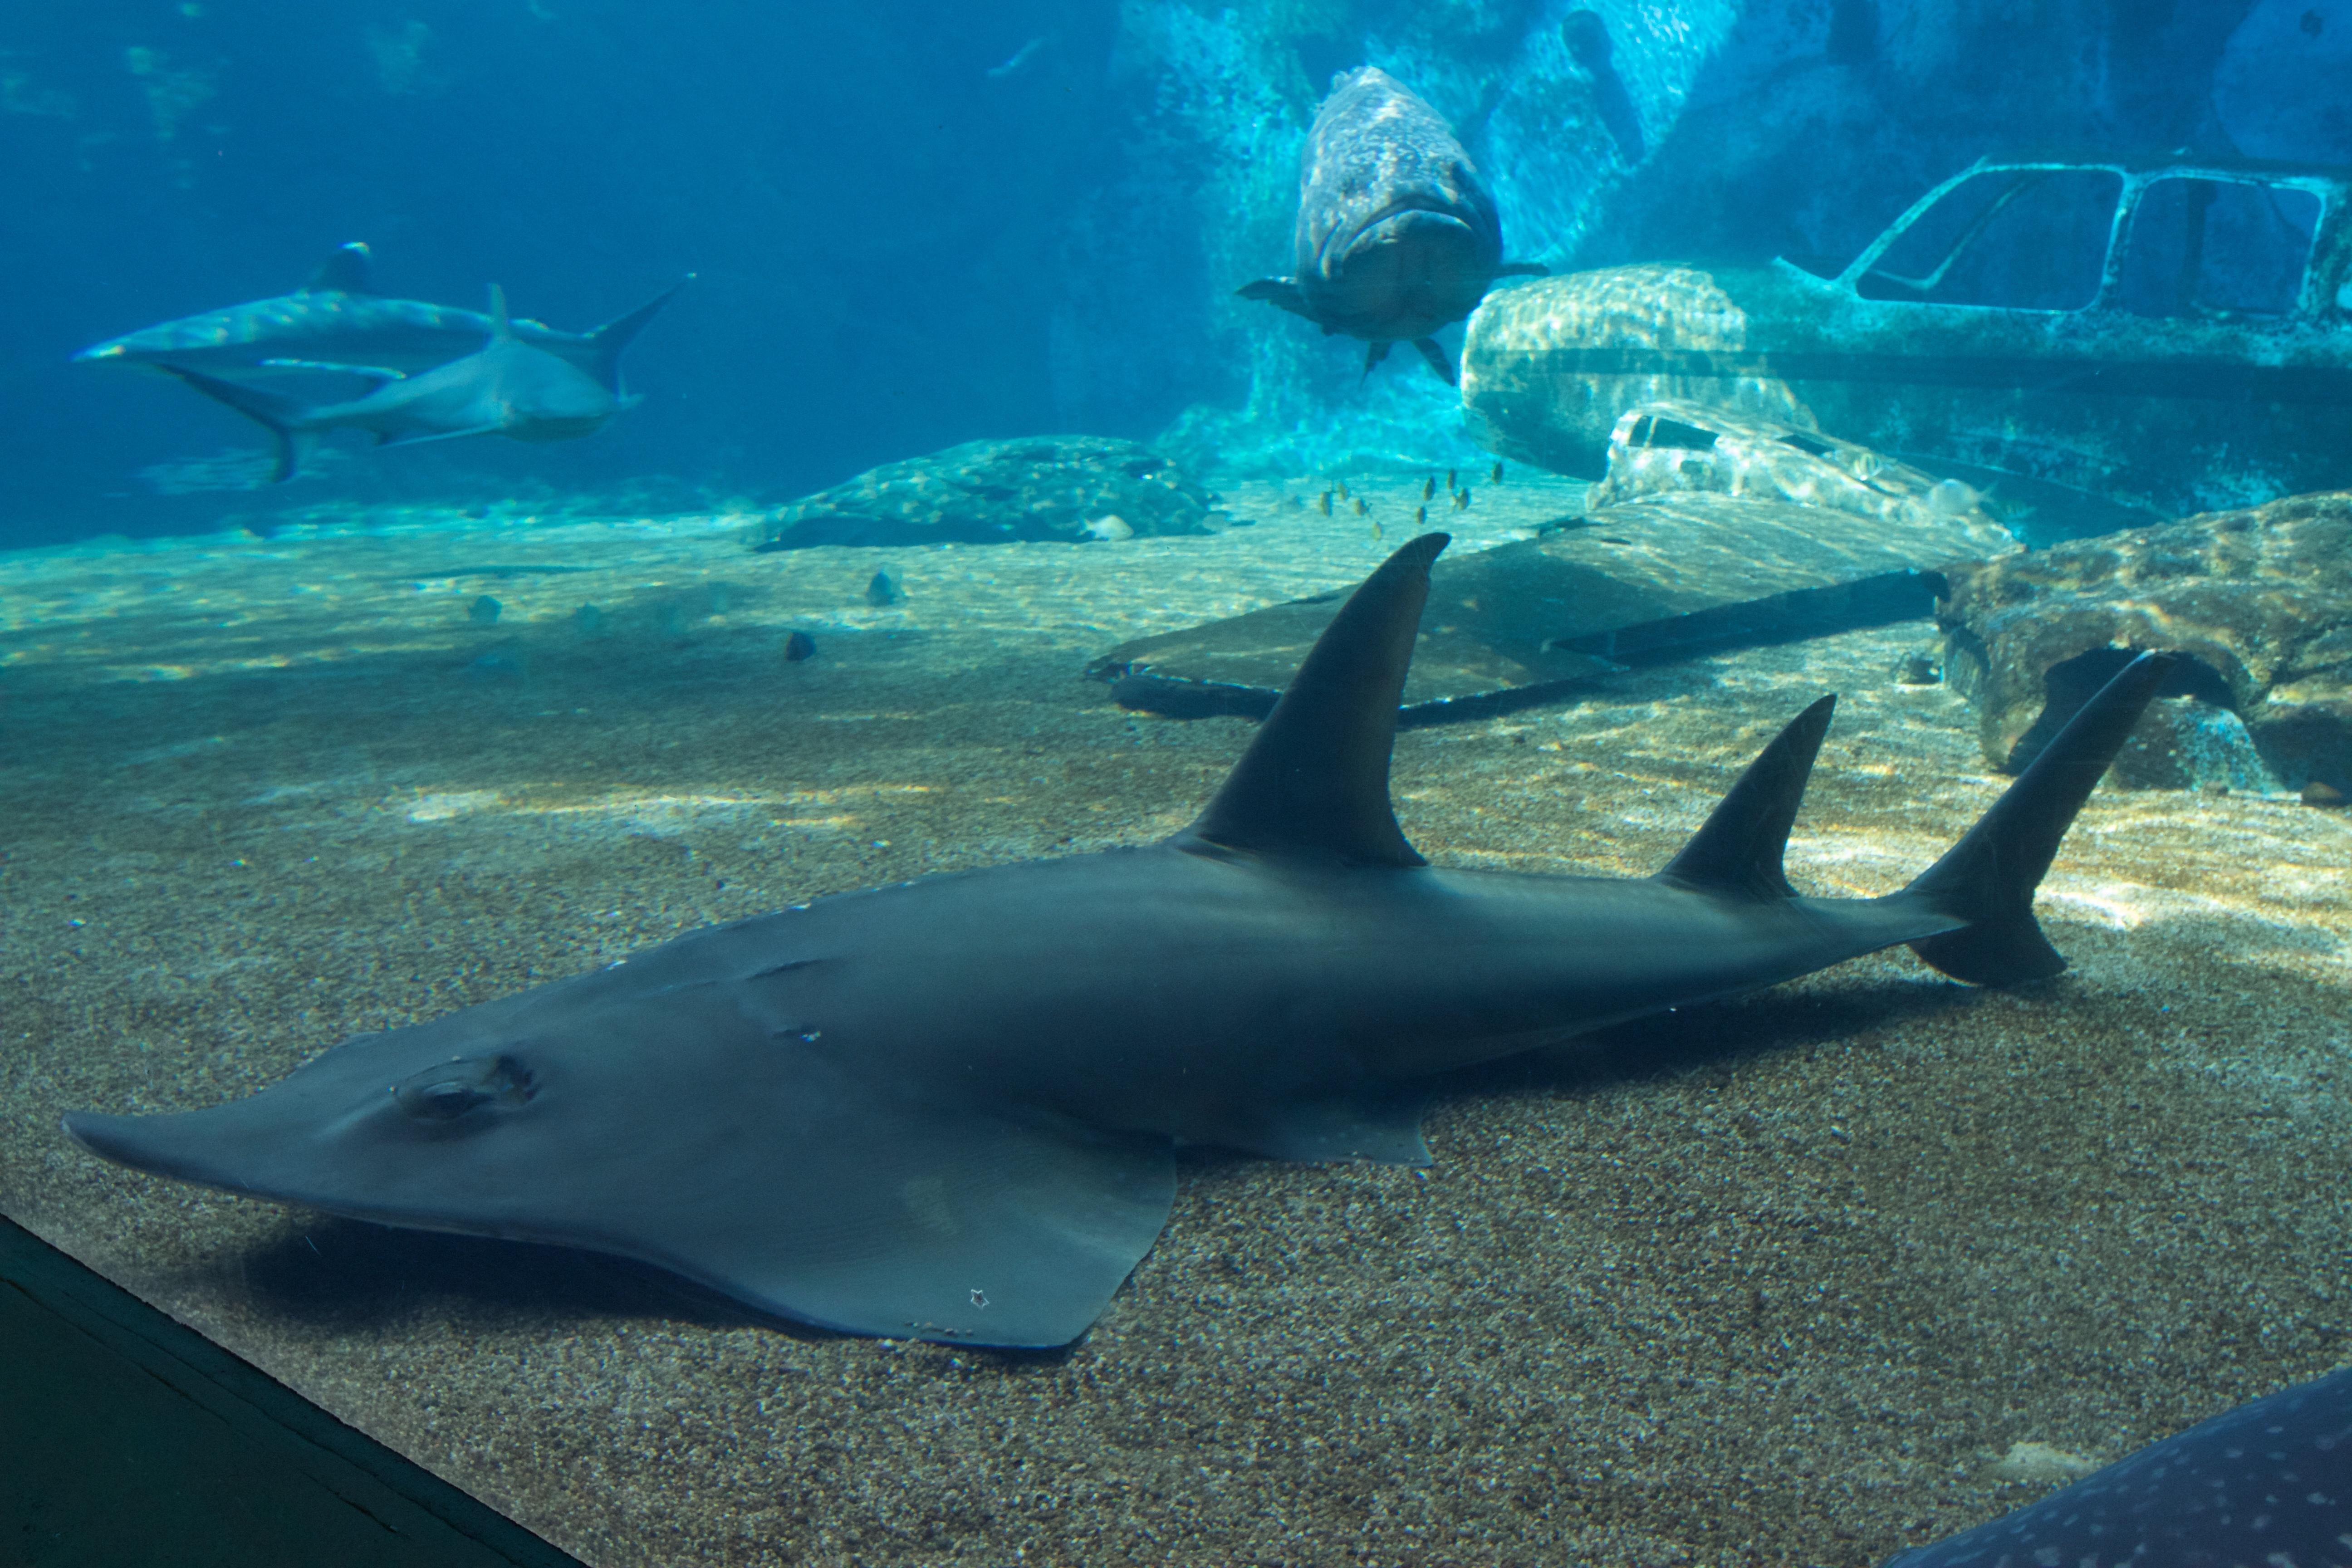 Image of Giant Guitarfish